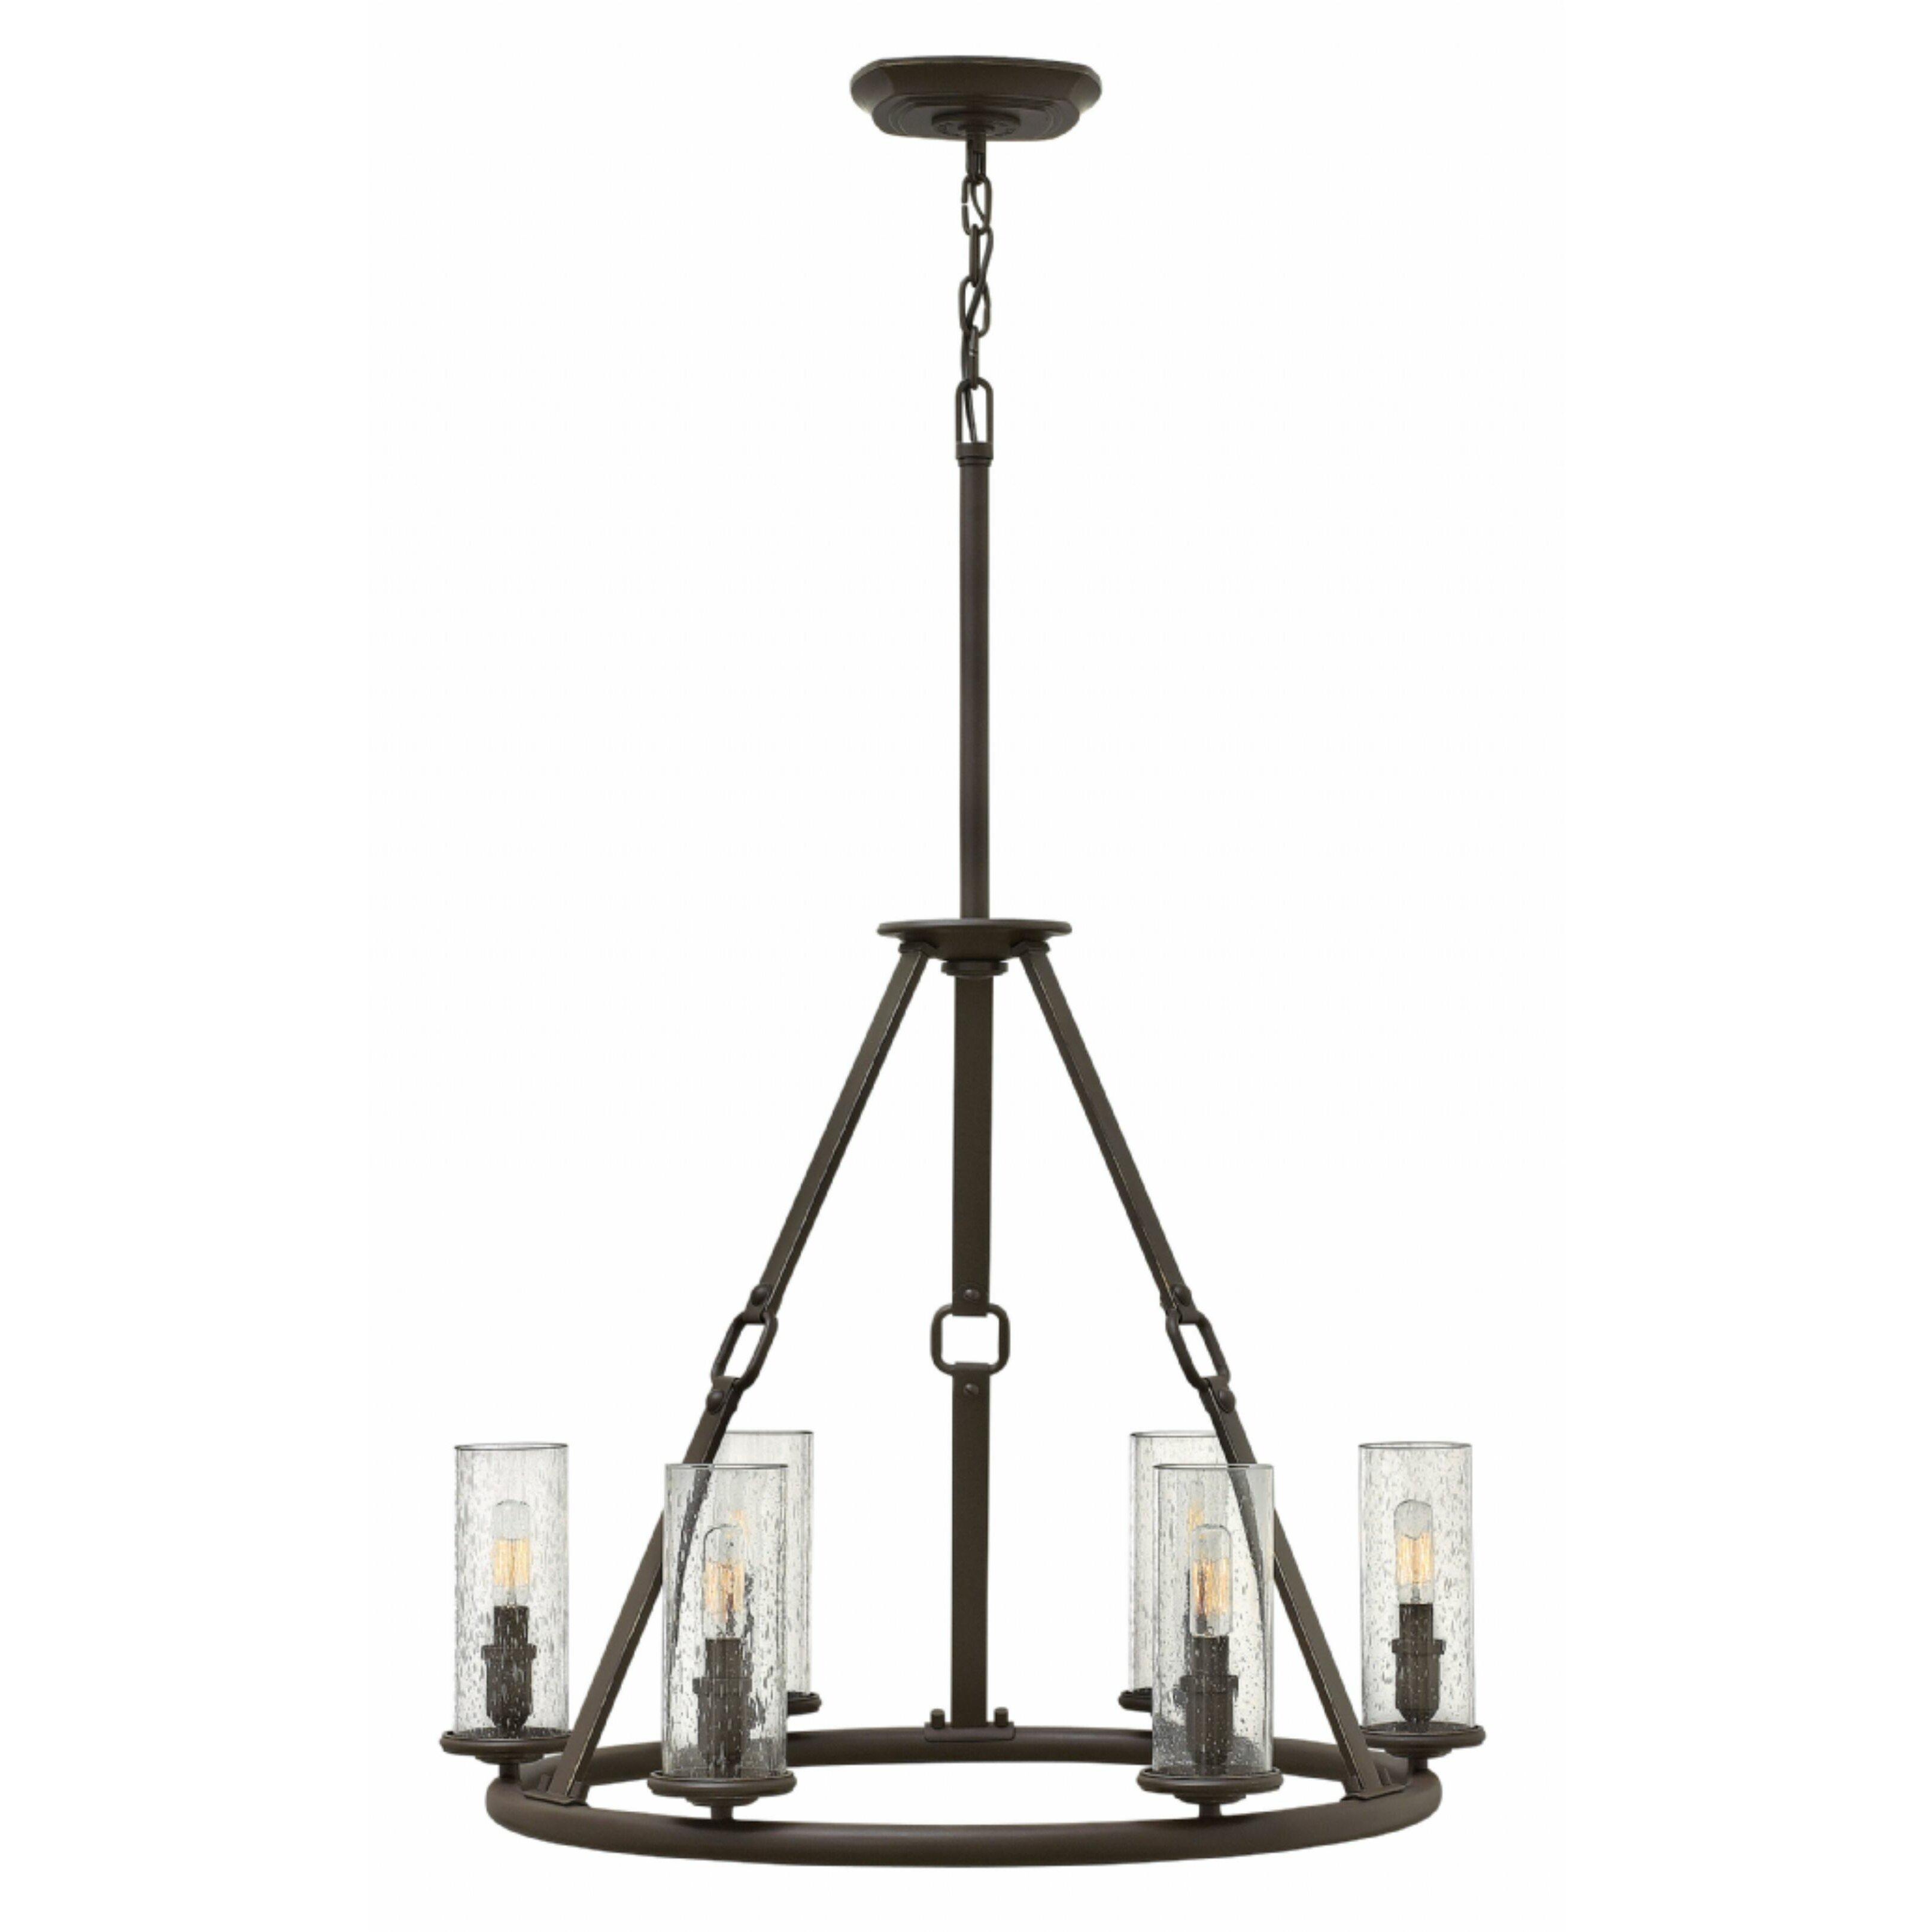 Hinkley Lighting Dakota 6 Light Candle Chandelier Reviews Wayfair